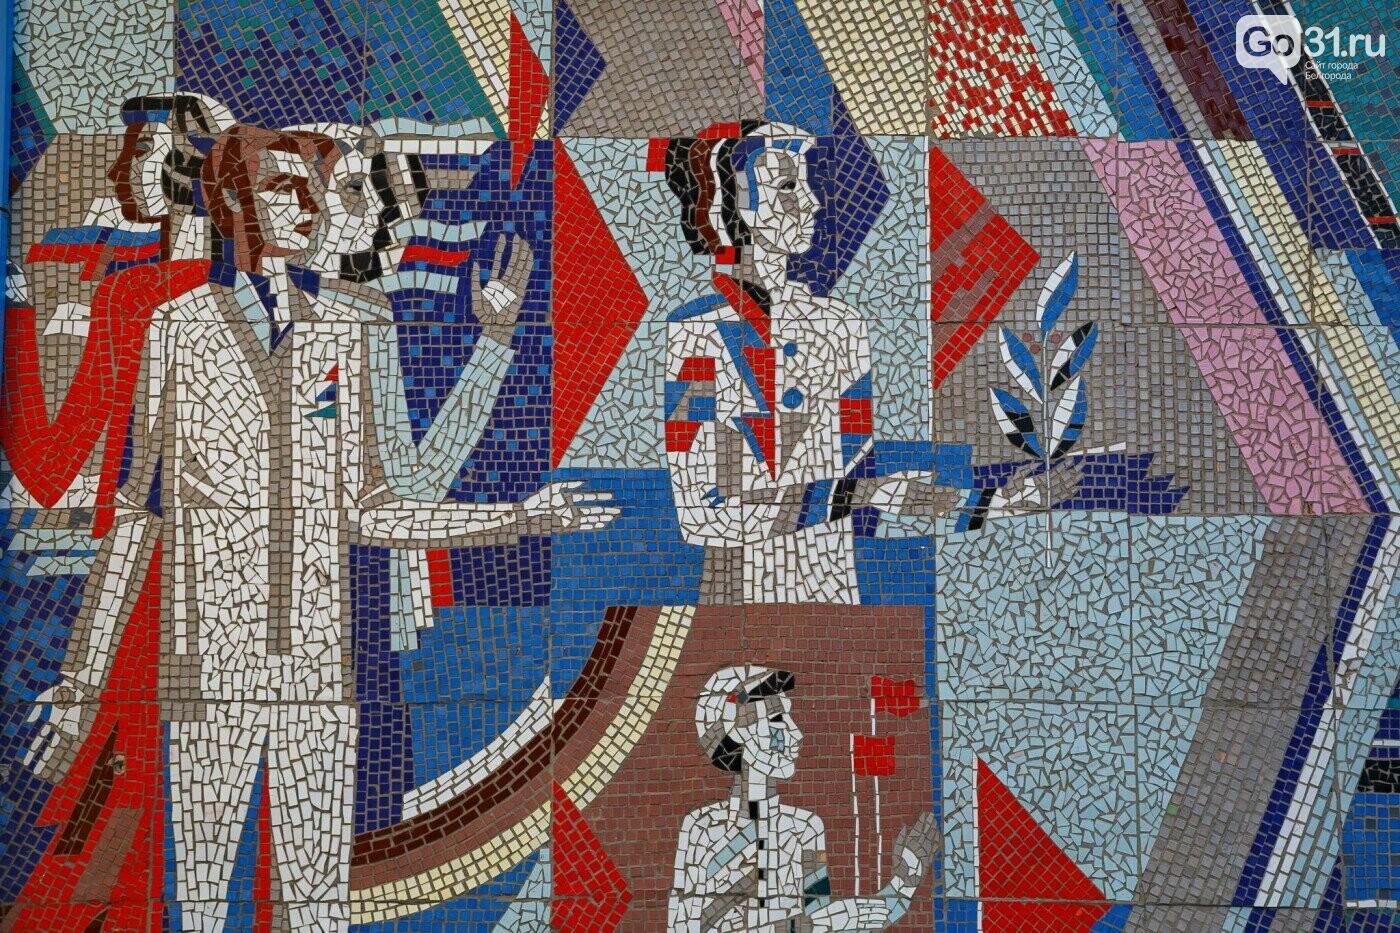 Мозаика в Белгороде, Фото: Антон Вергун